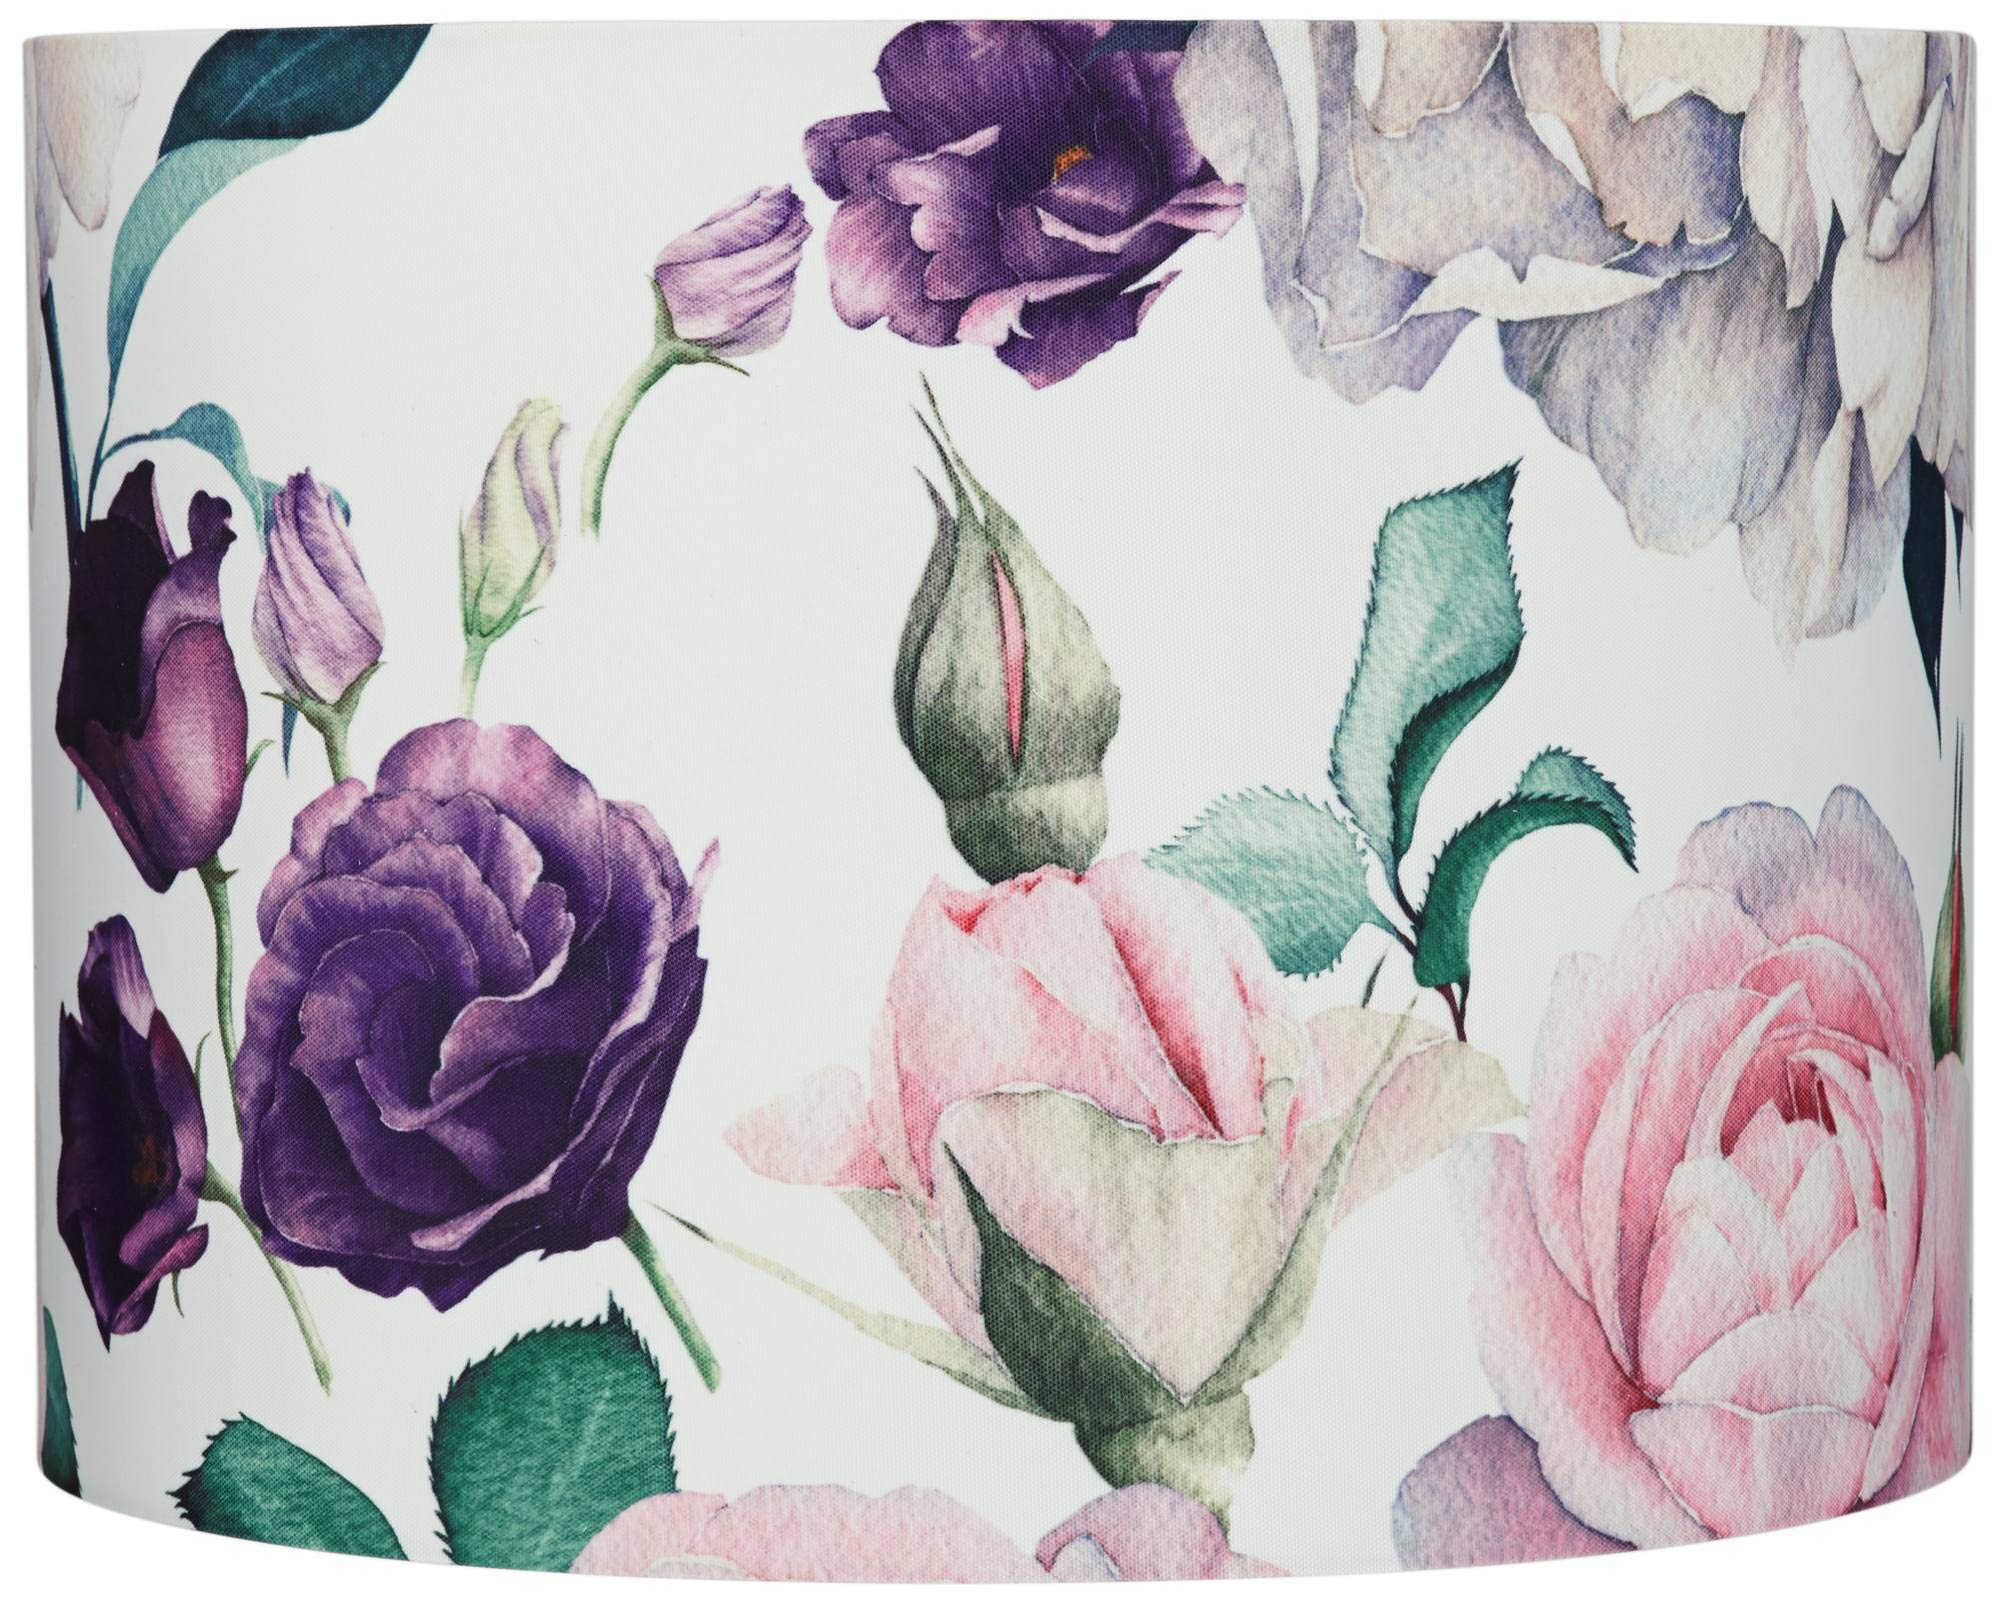 Blush Rose Floral Drum Lamp Shade 15x16x11 (Spider) - Springcrest